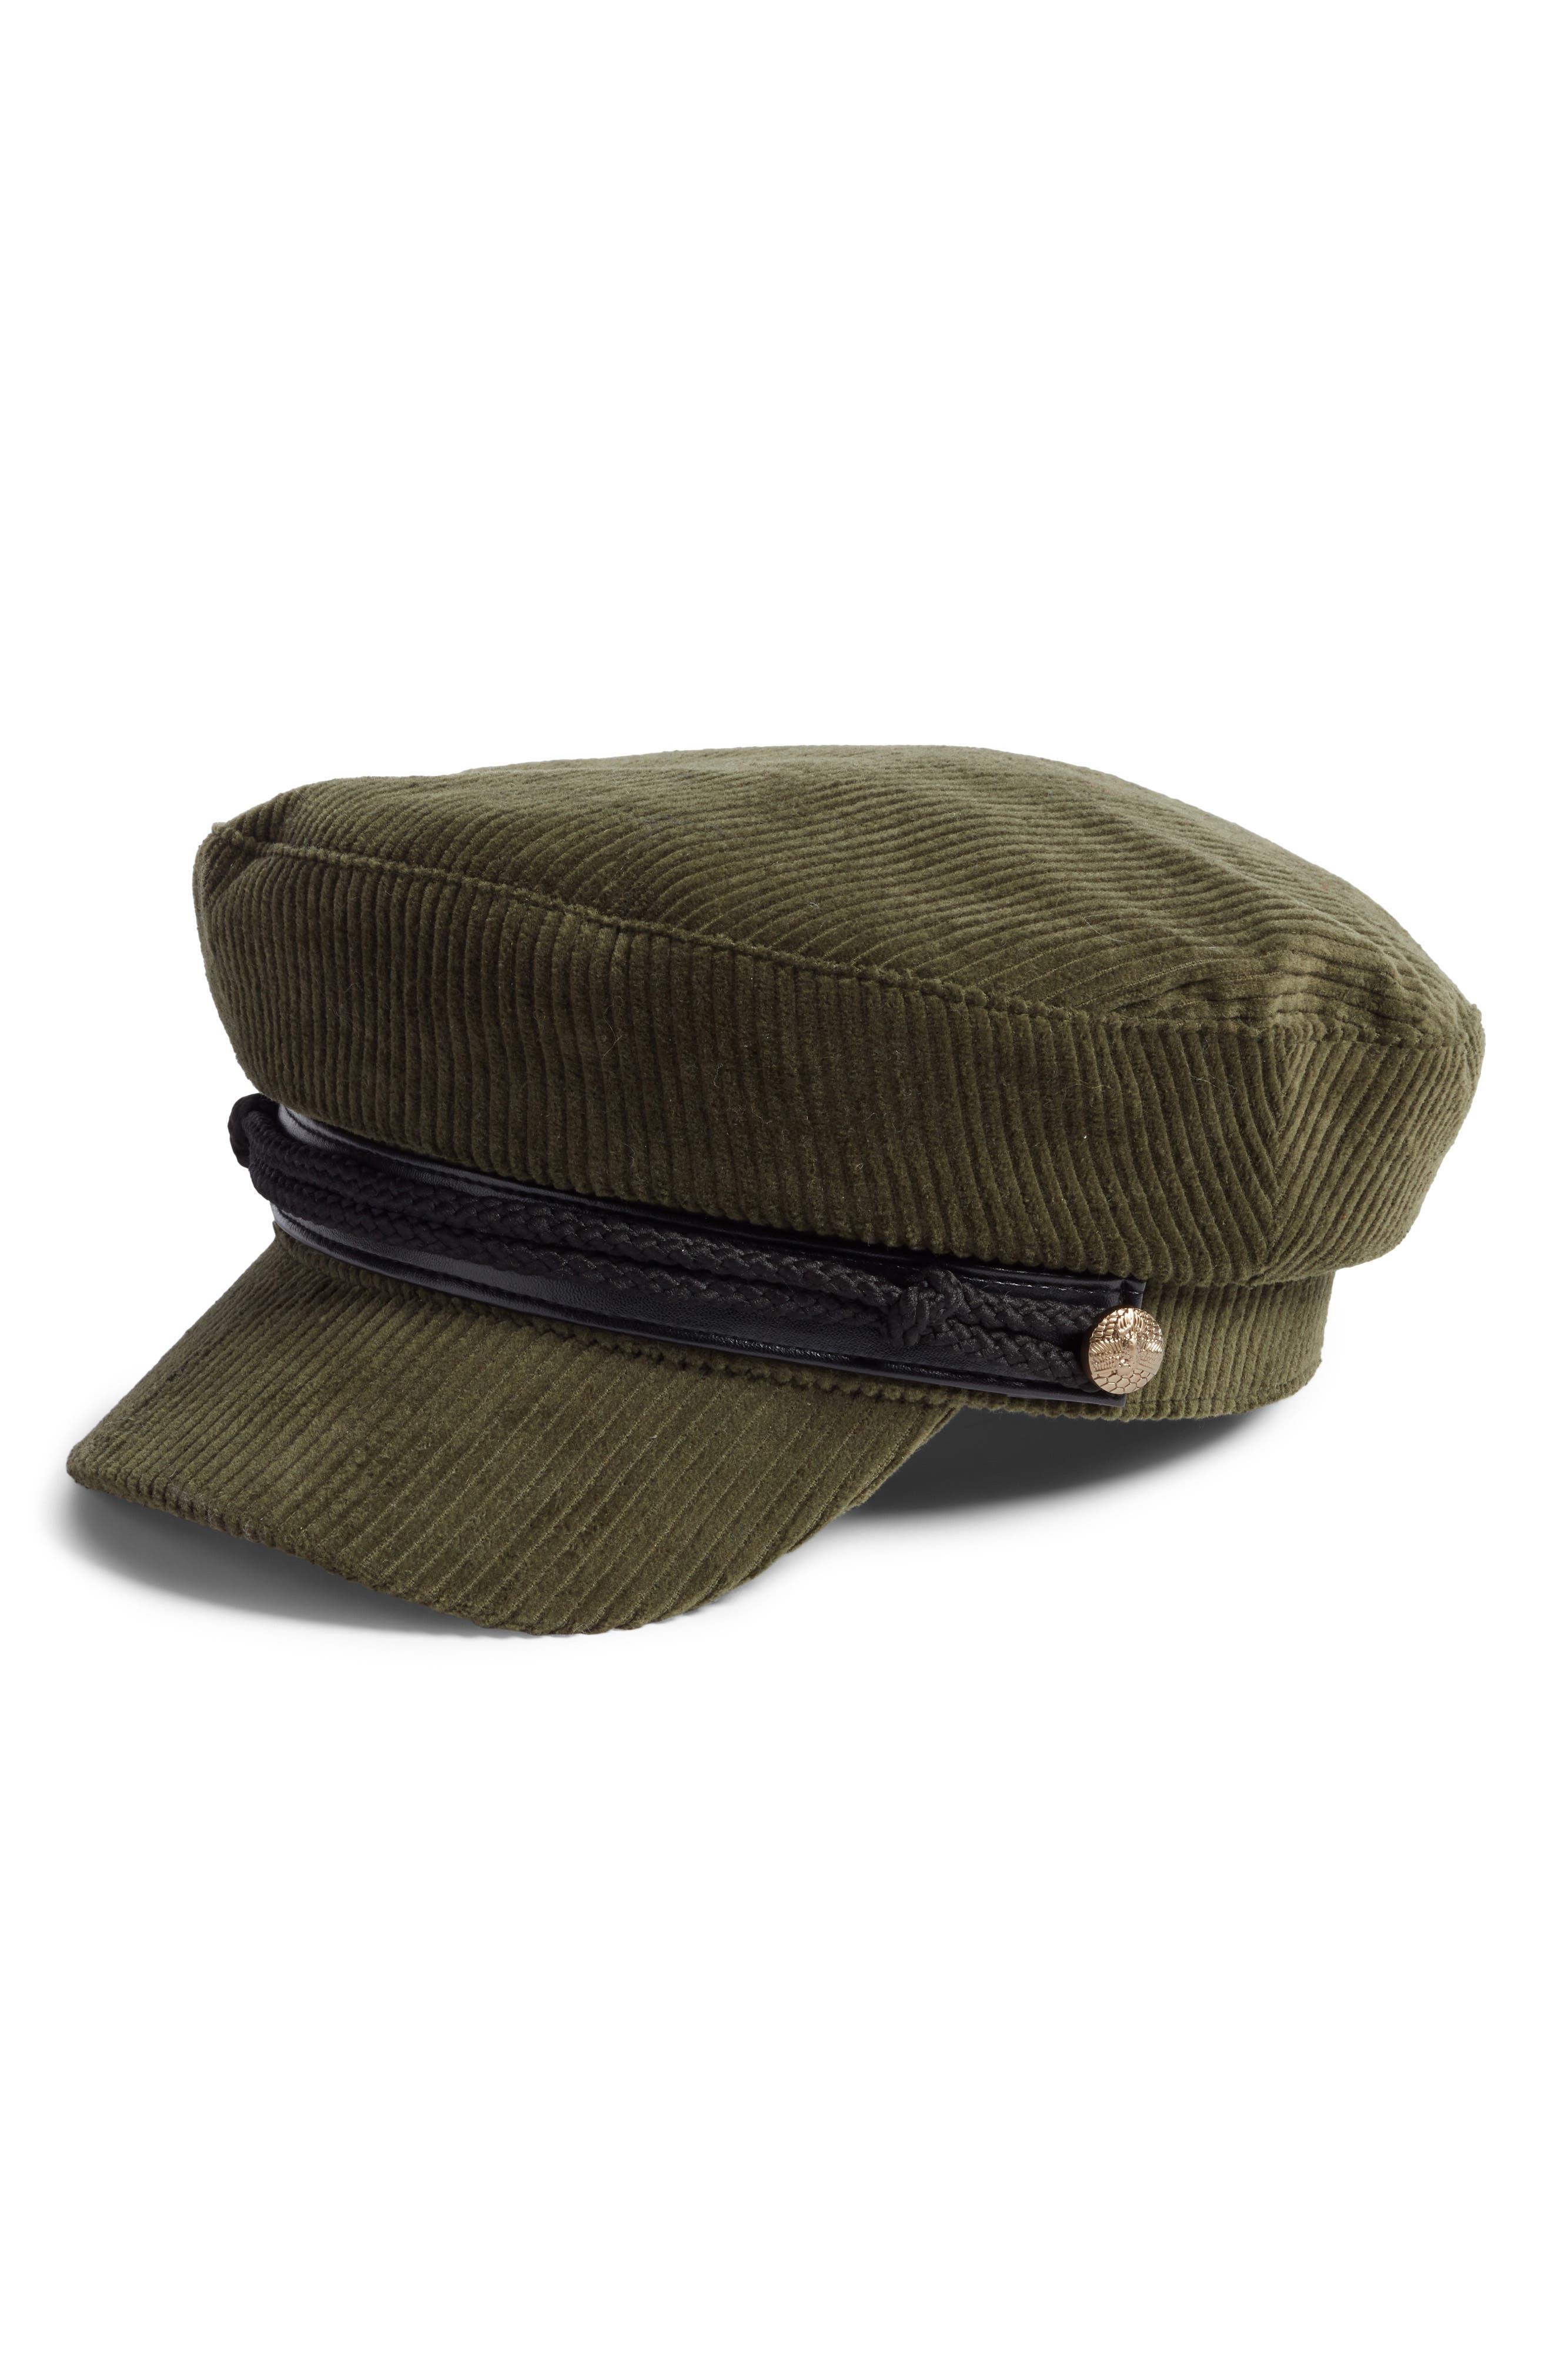 Corduroy Baker Boy Hat,                             Main thumbnail 1, color,                             OLIVE